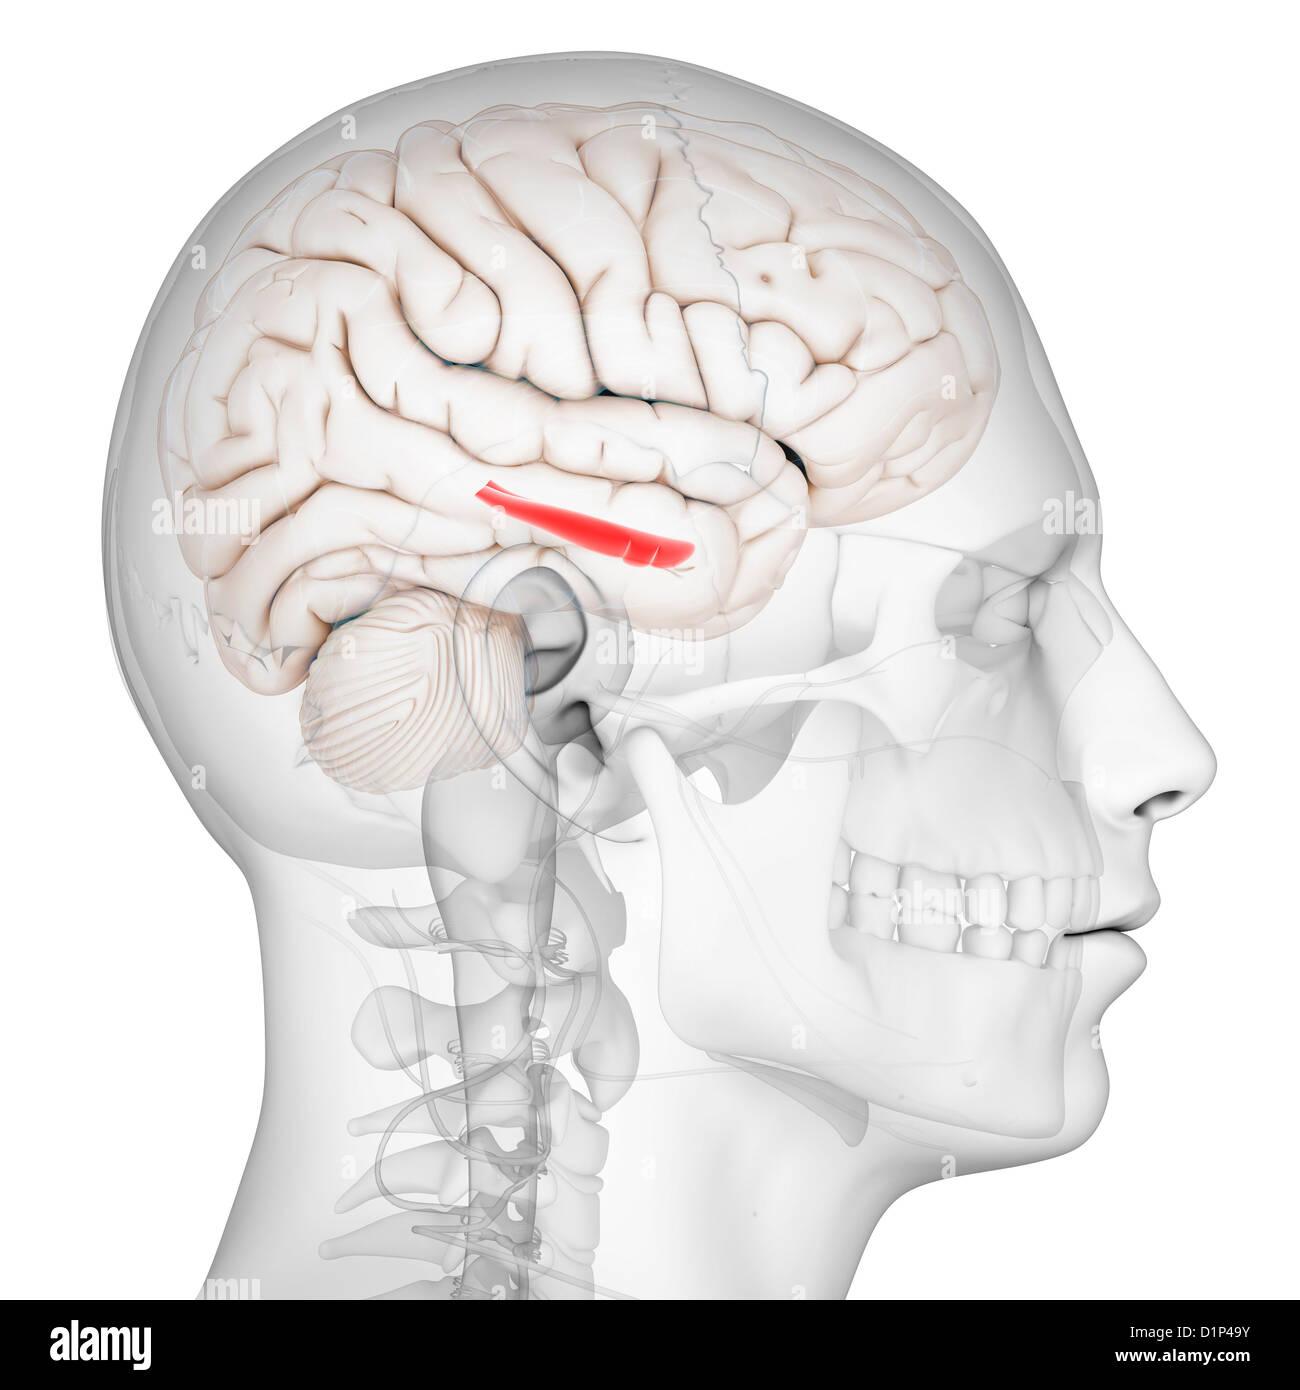 Hippocampus Brain Stock Photos & Hippocampus Brain Stock Images - Alamy